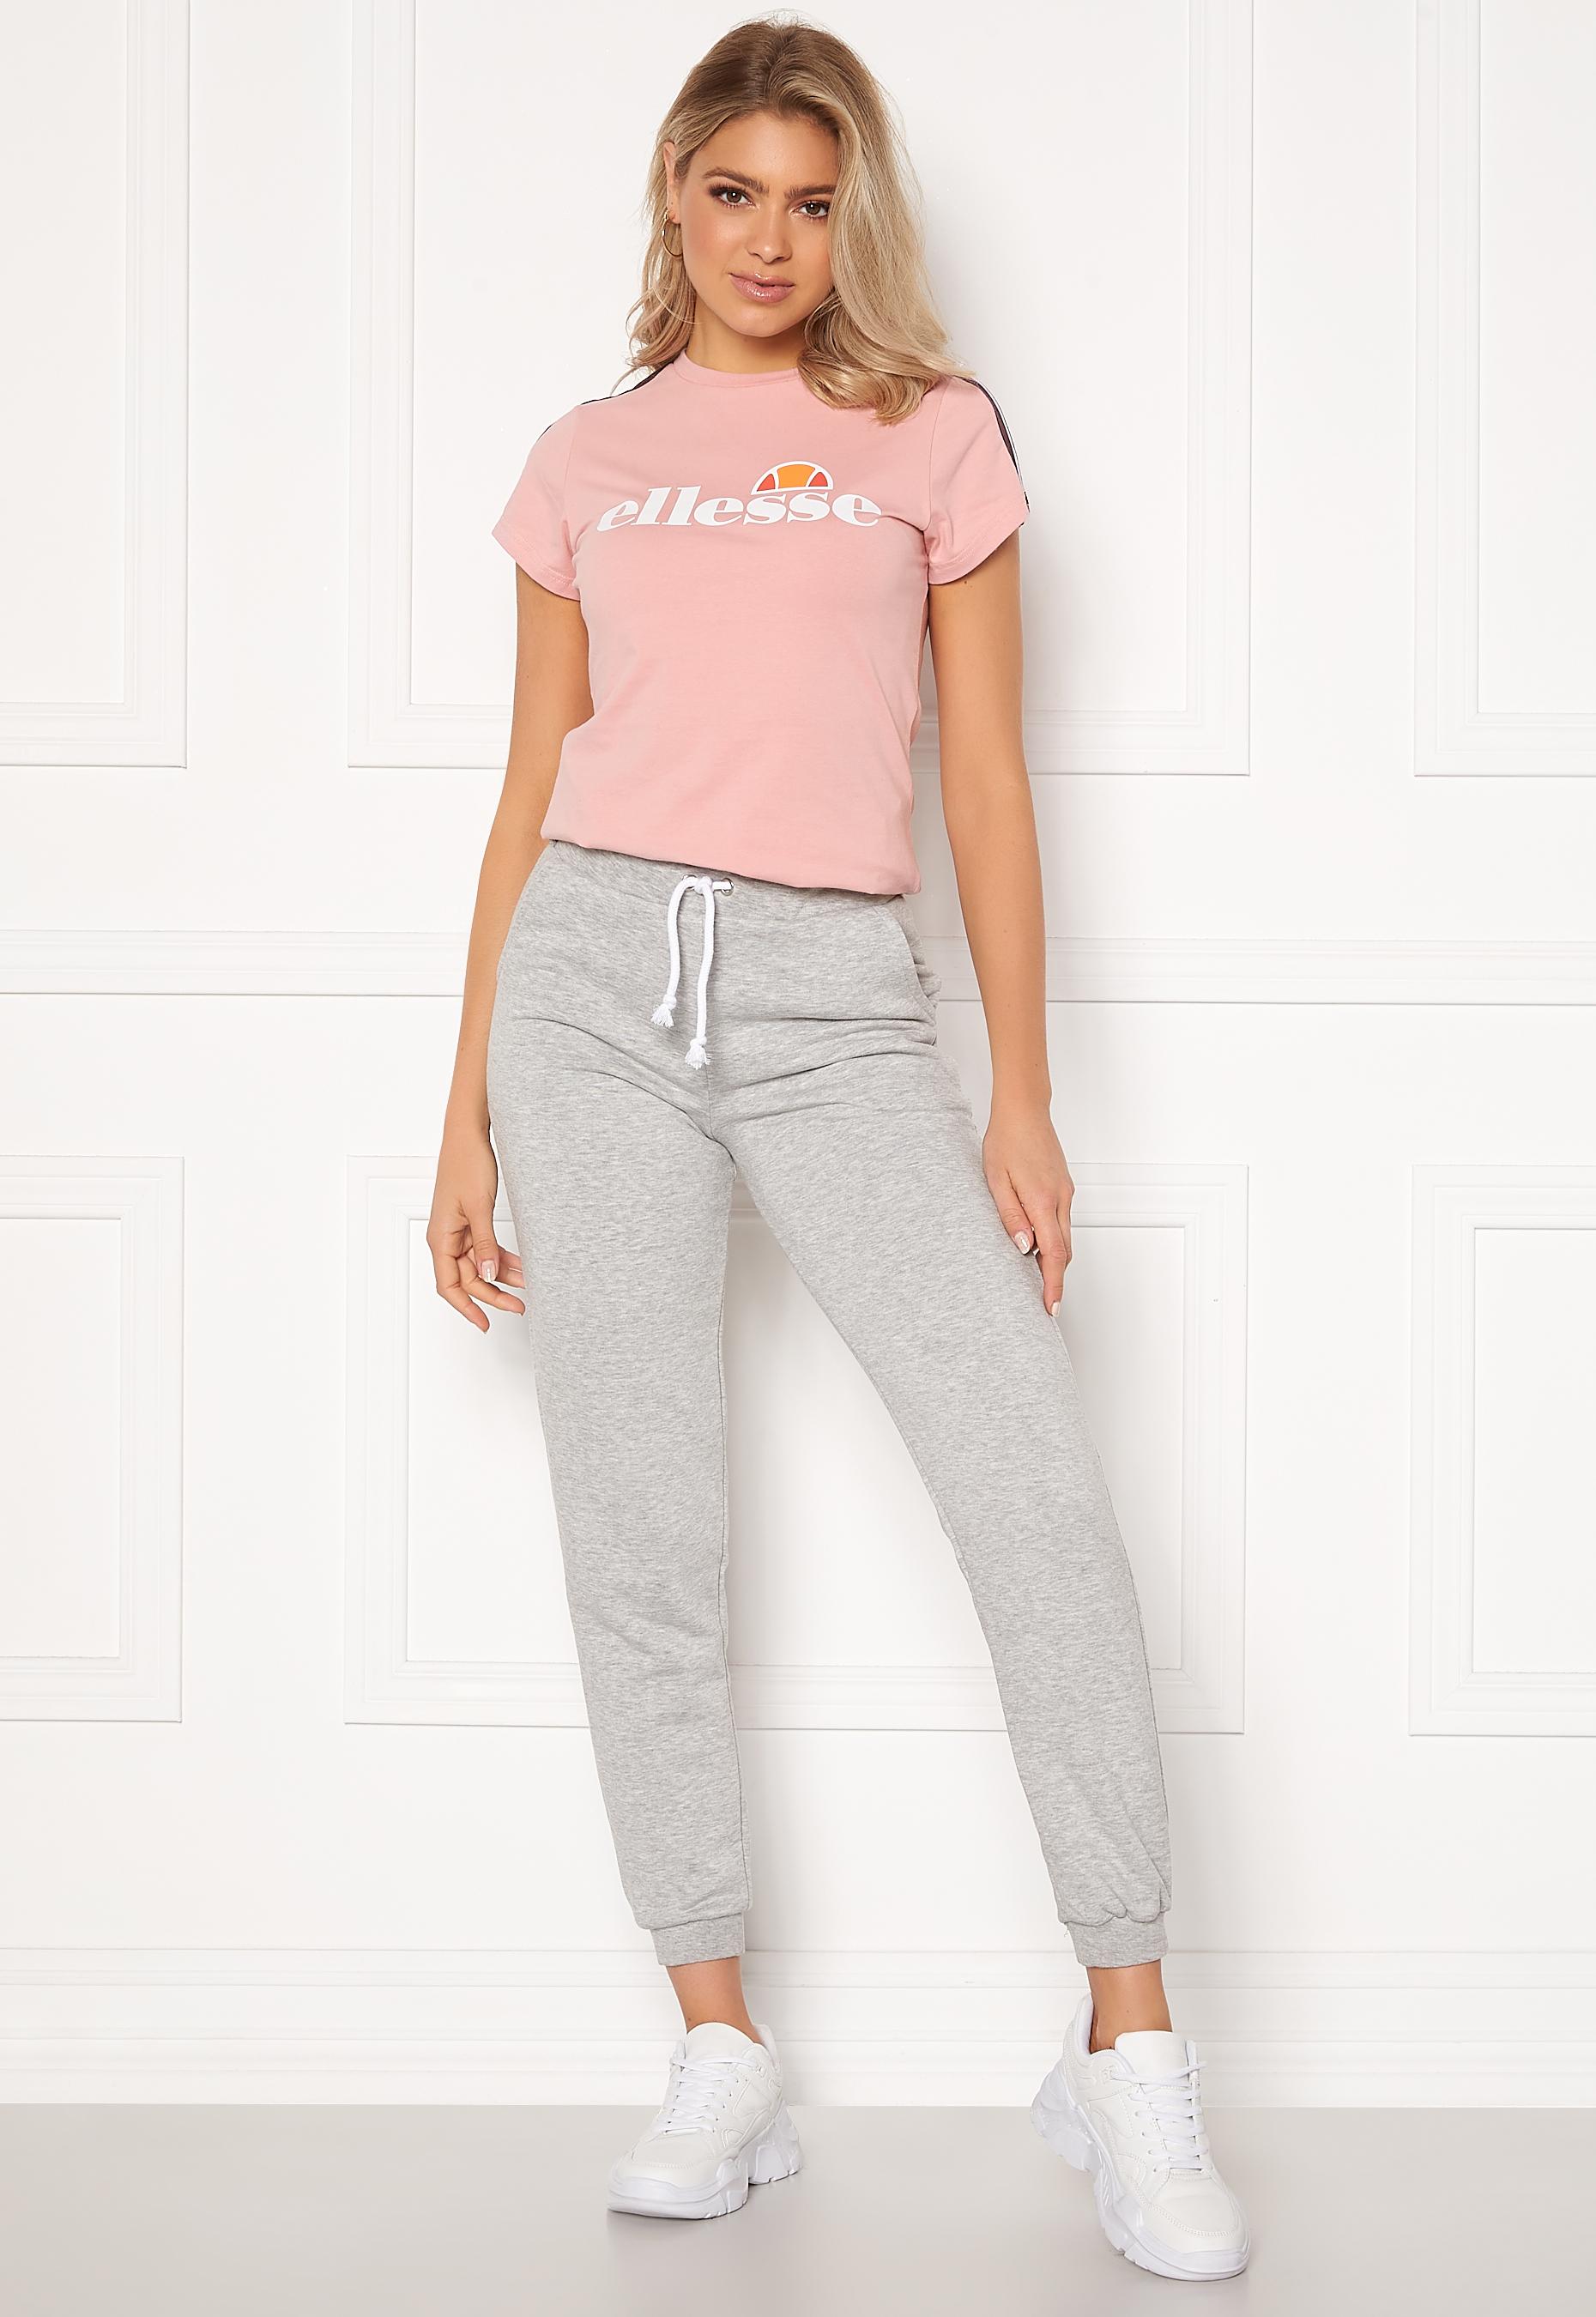 Ellesse Womens Malis T-Shirt